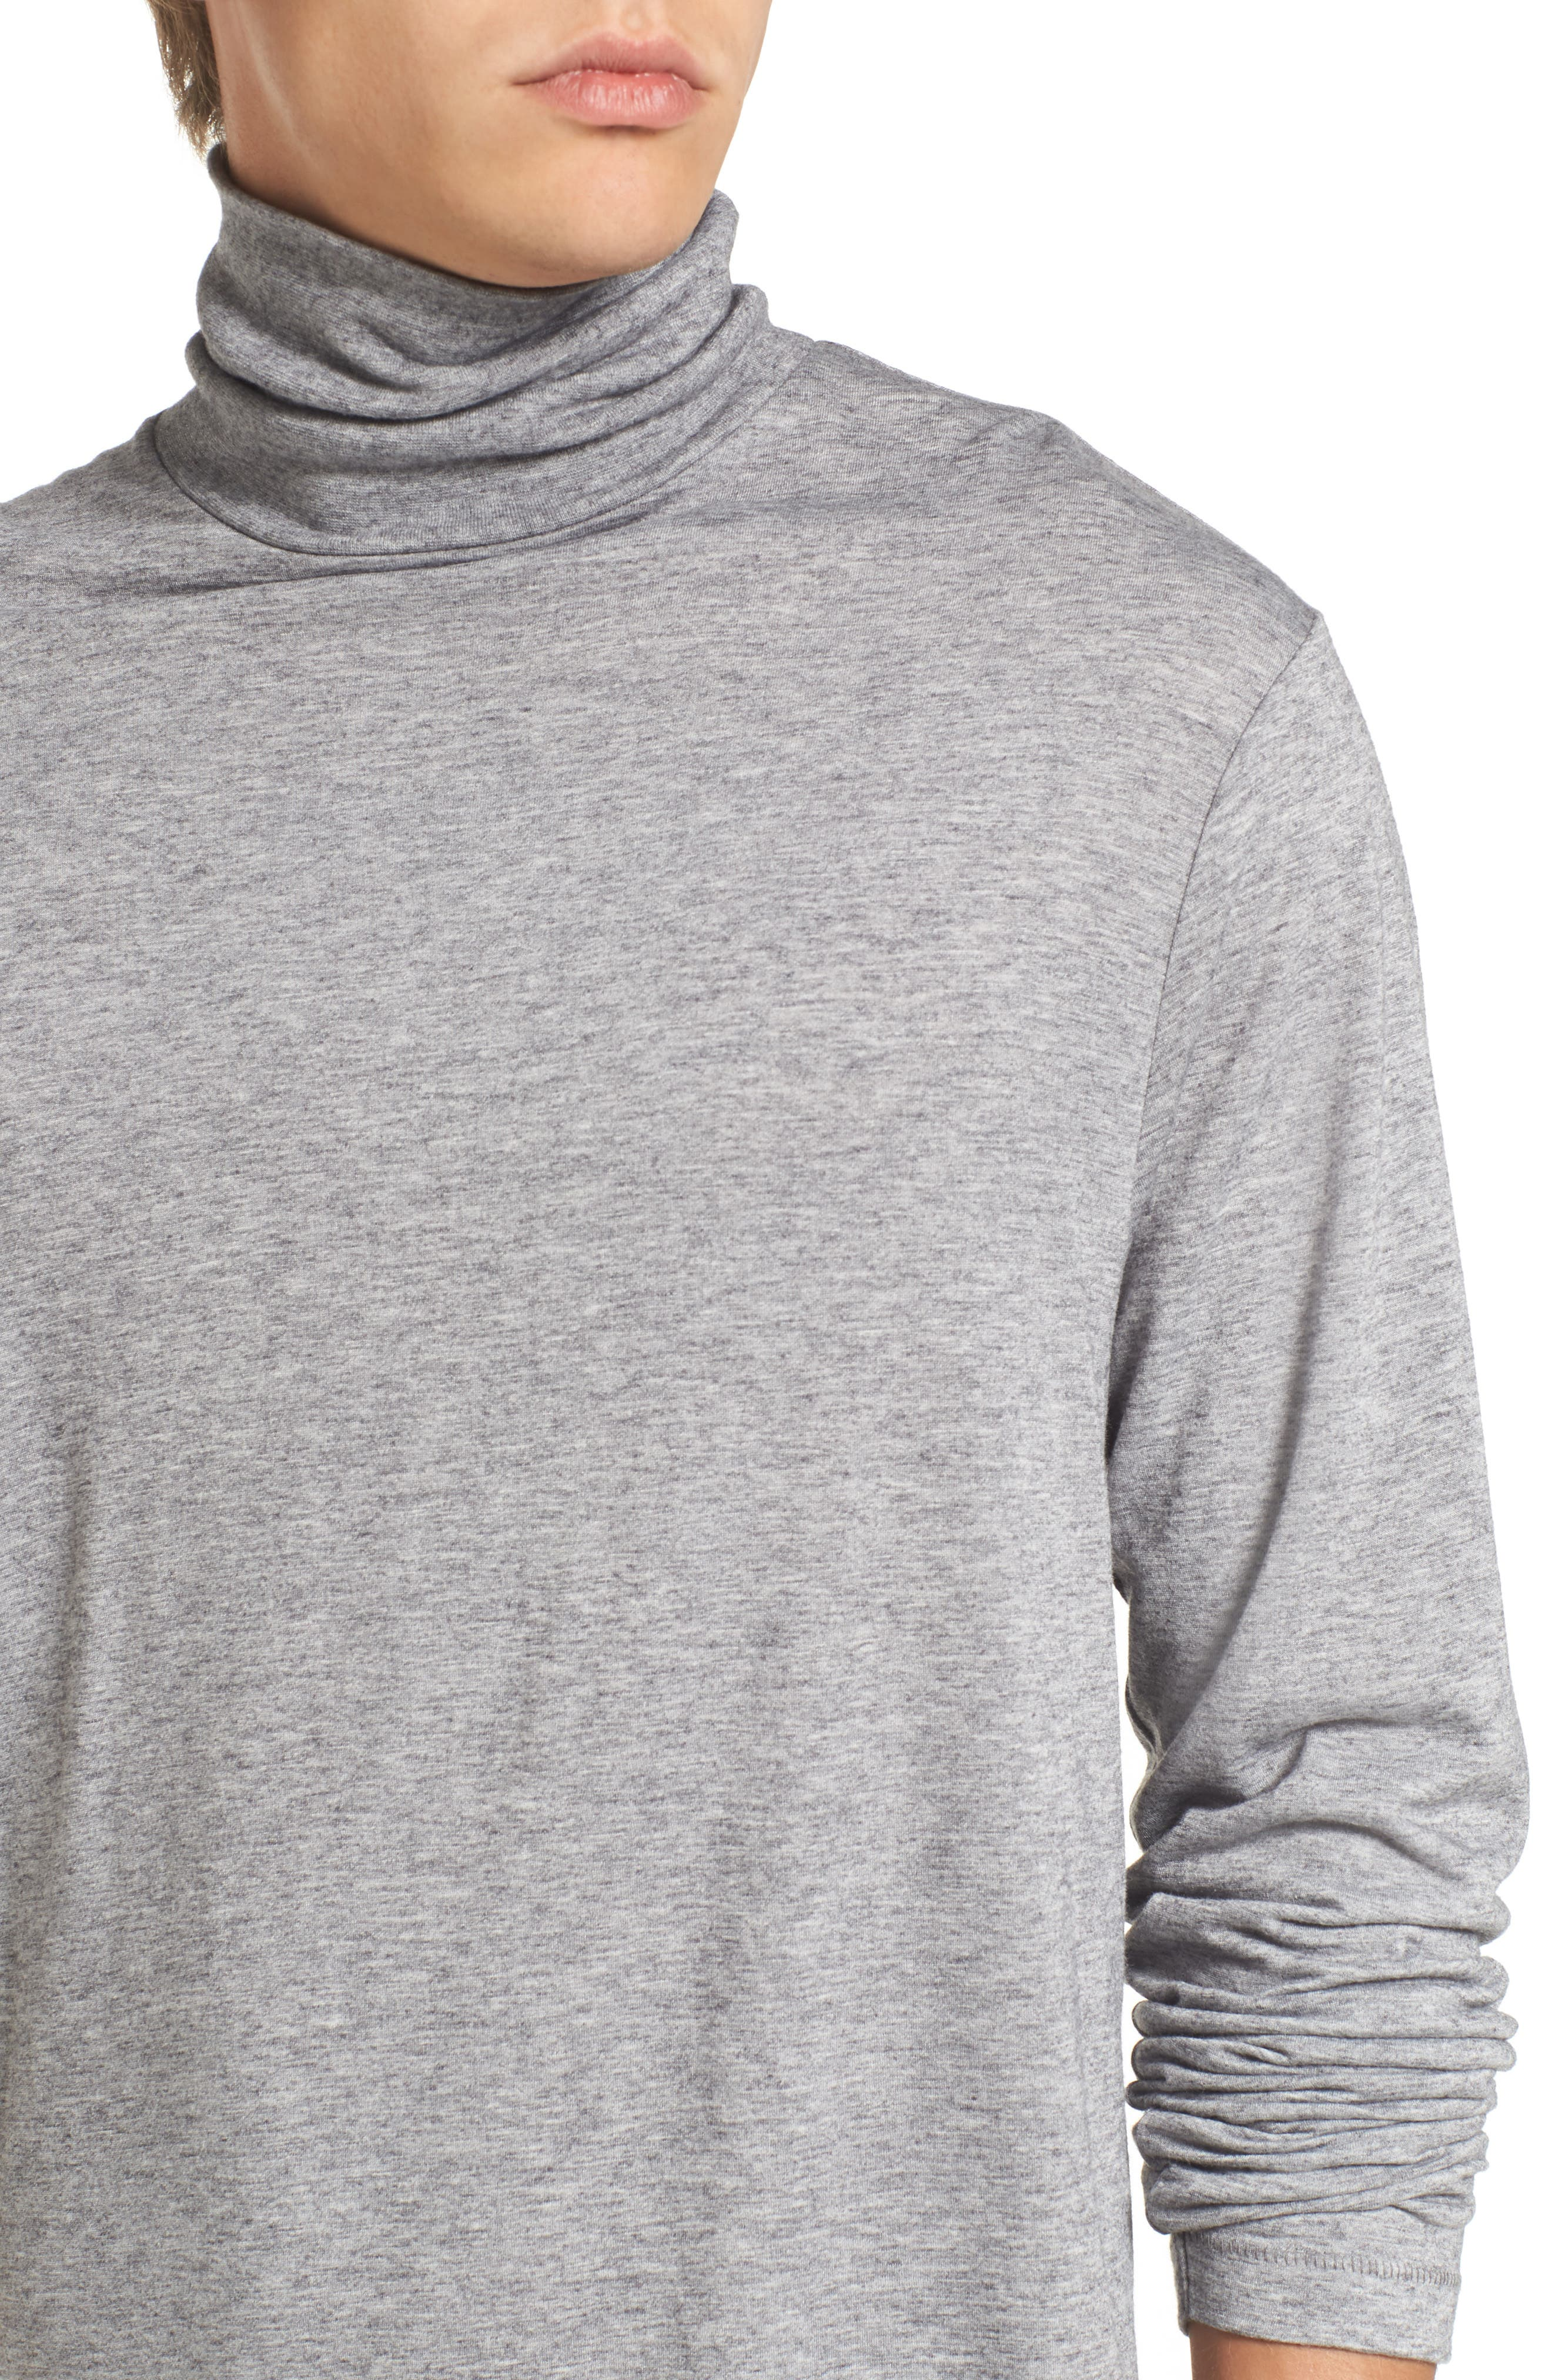 Lightweight Turtleneck Sweater,                             Alternate thumbnail 4, color,